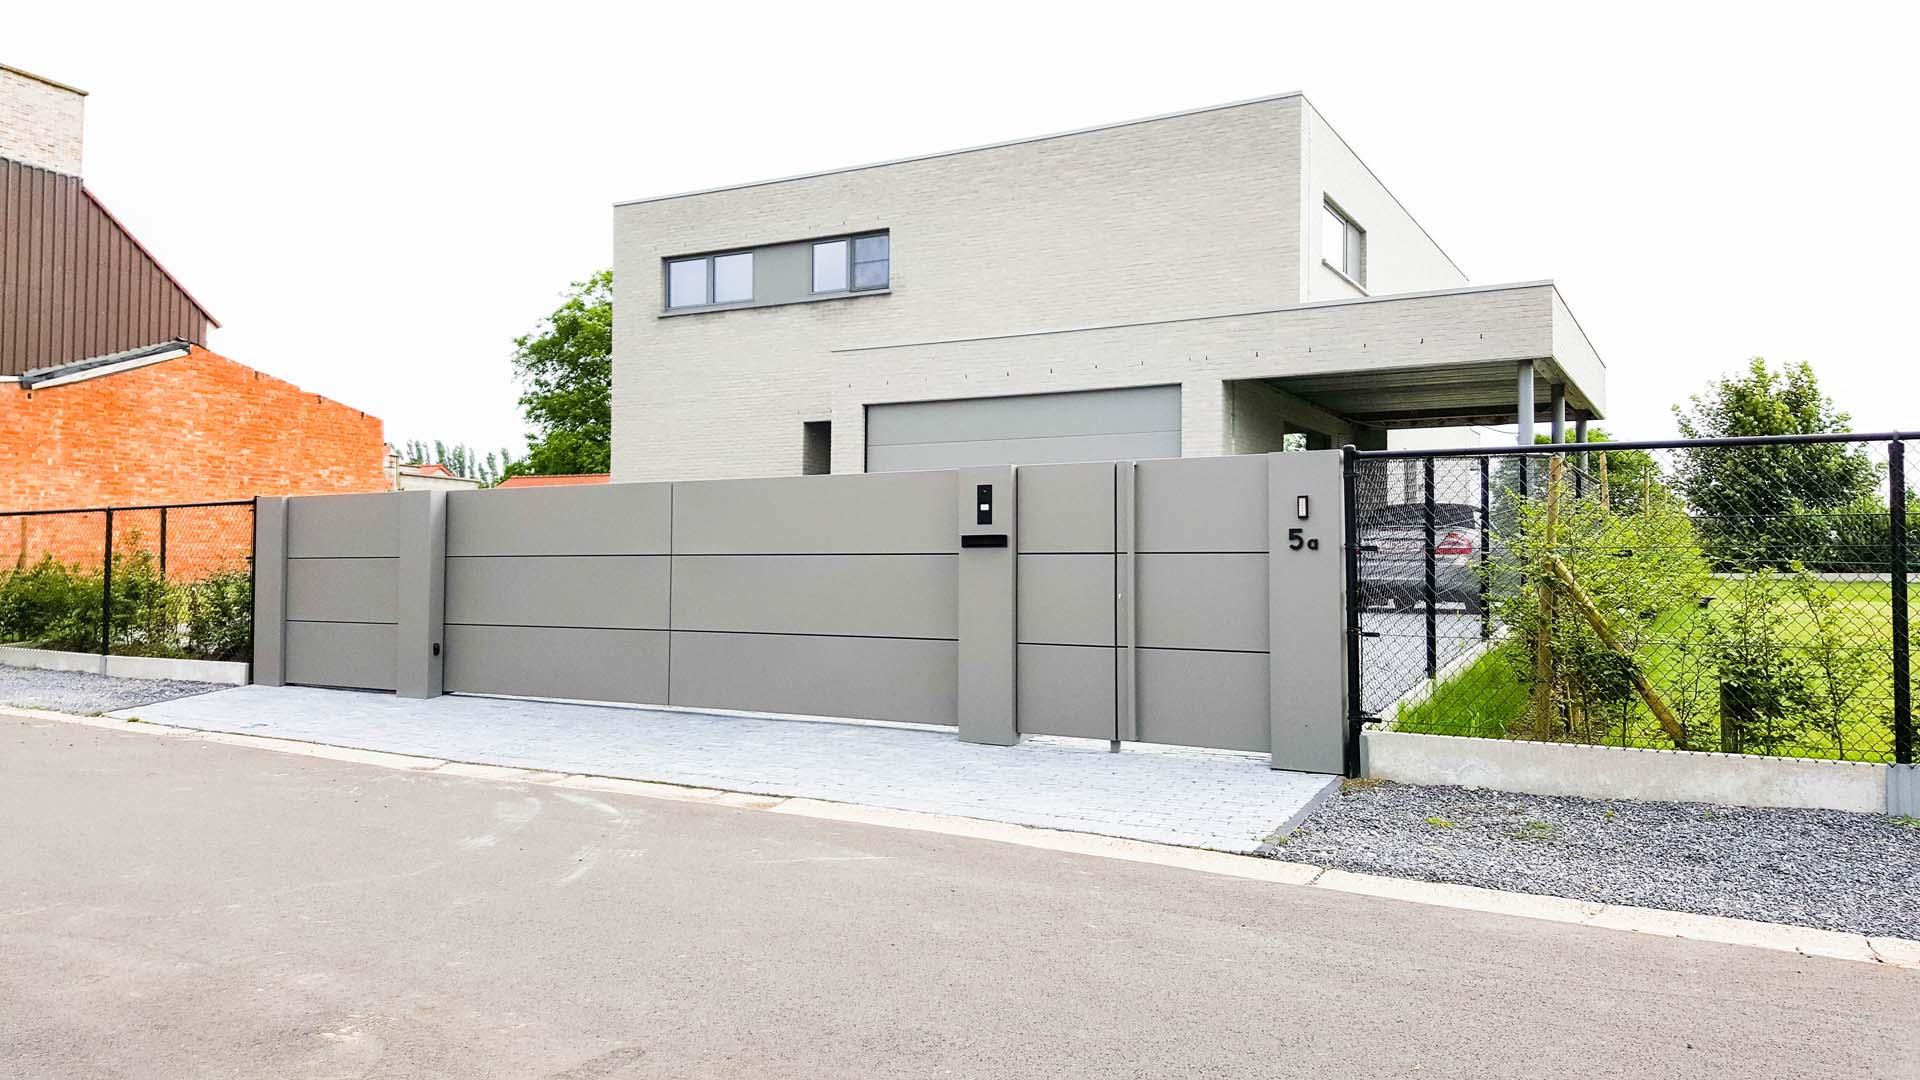 Moderne aluminium design schuifpoort met aluminium panelen te Rijkel Limburg